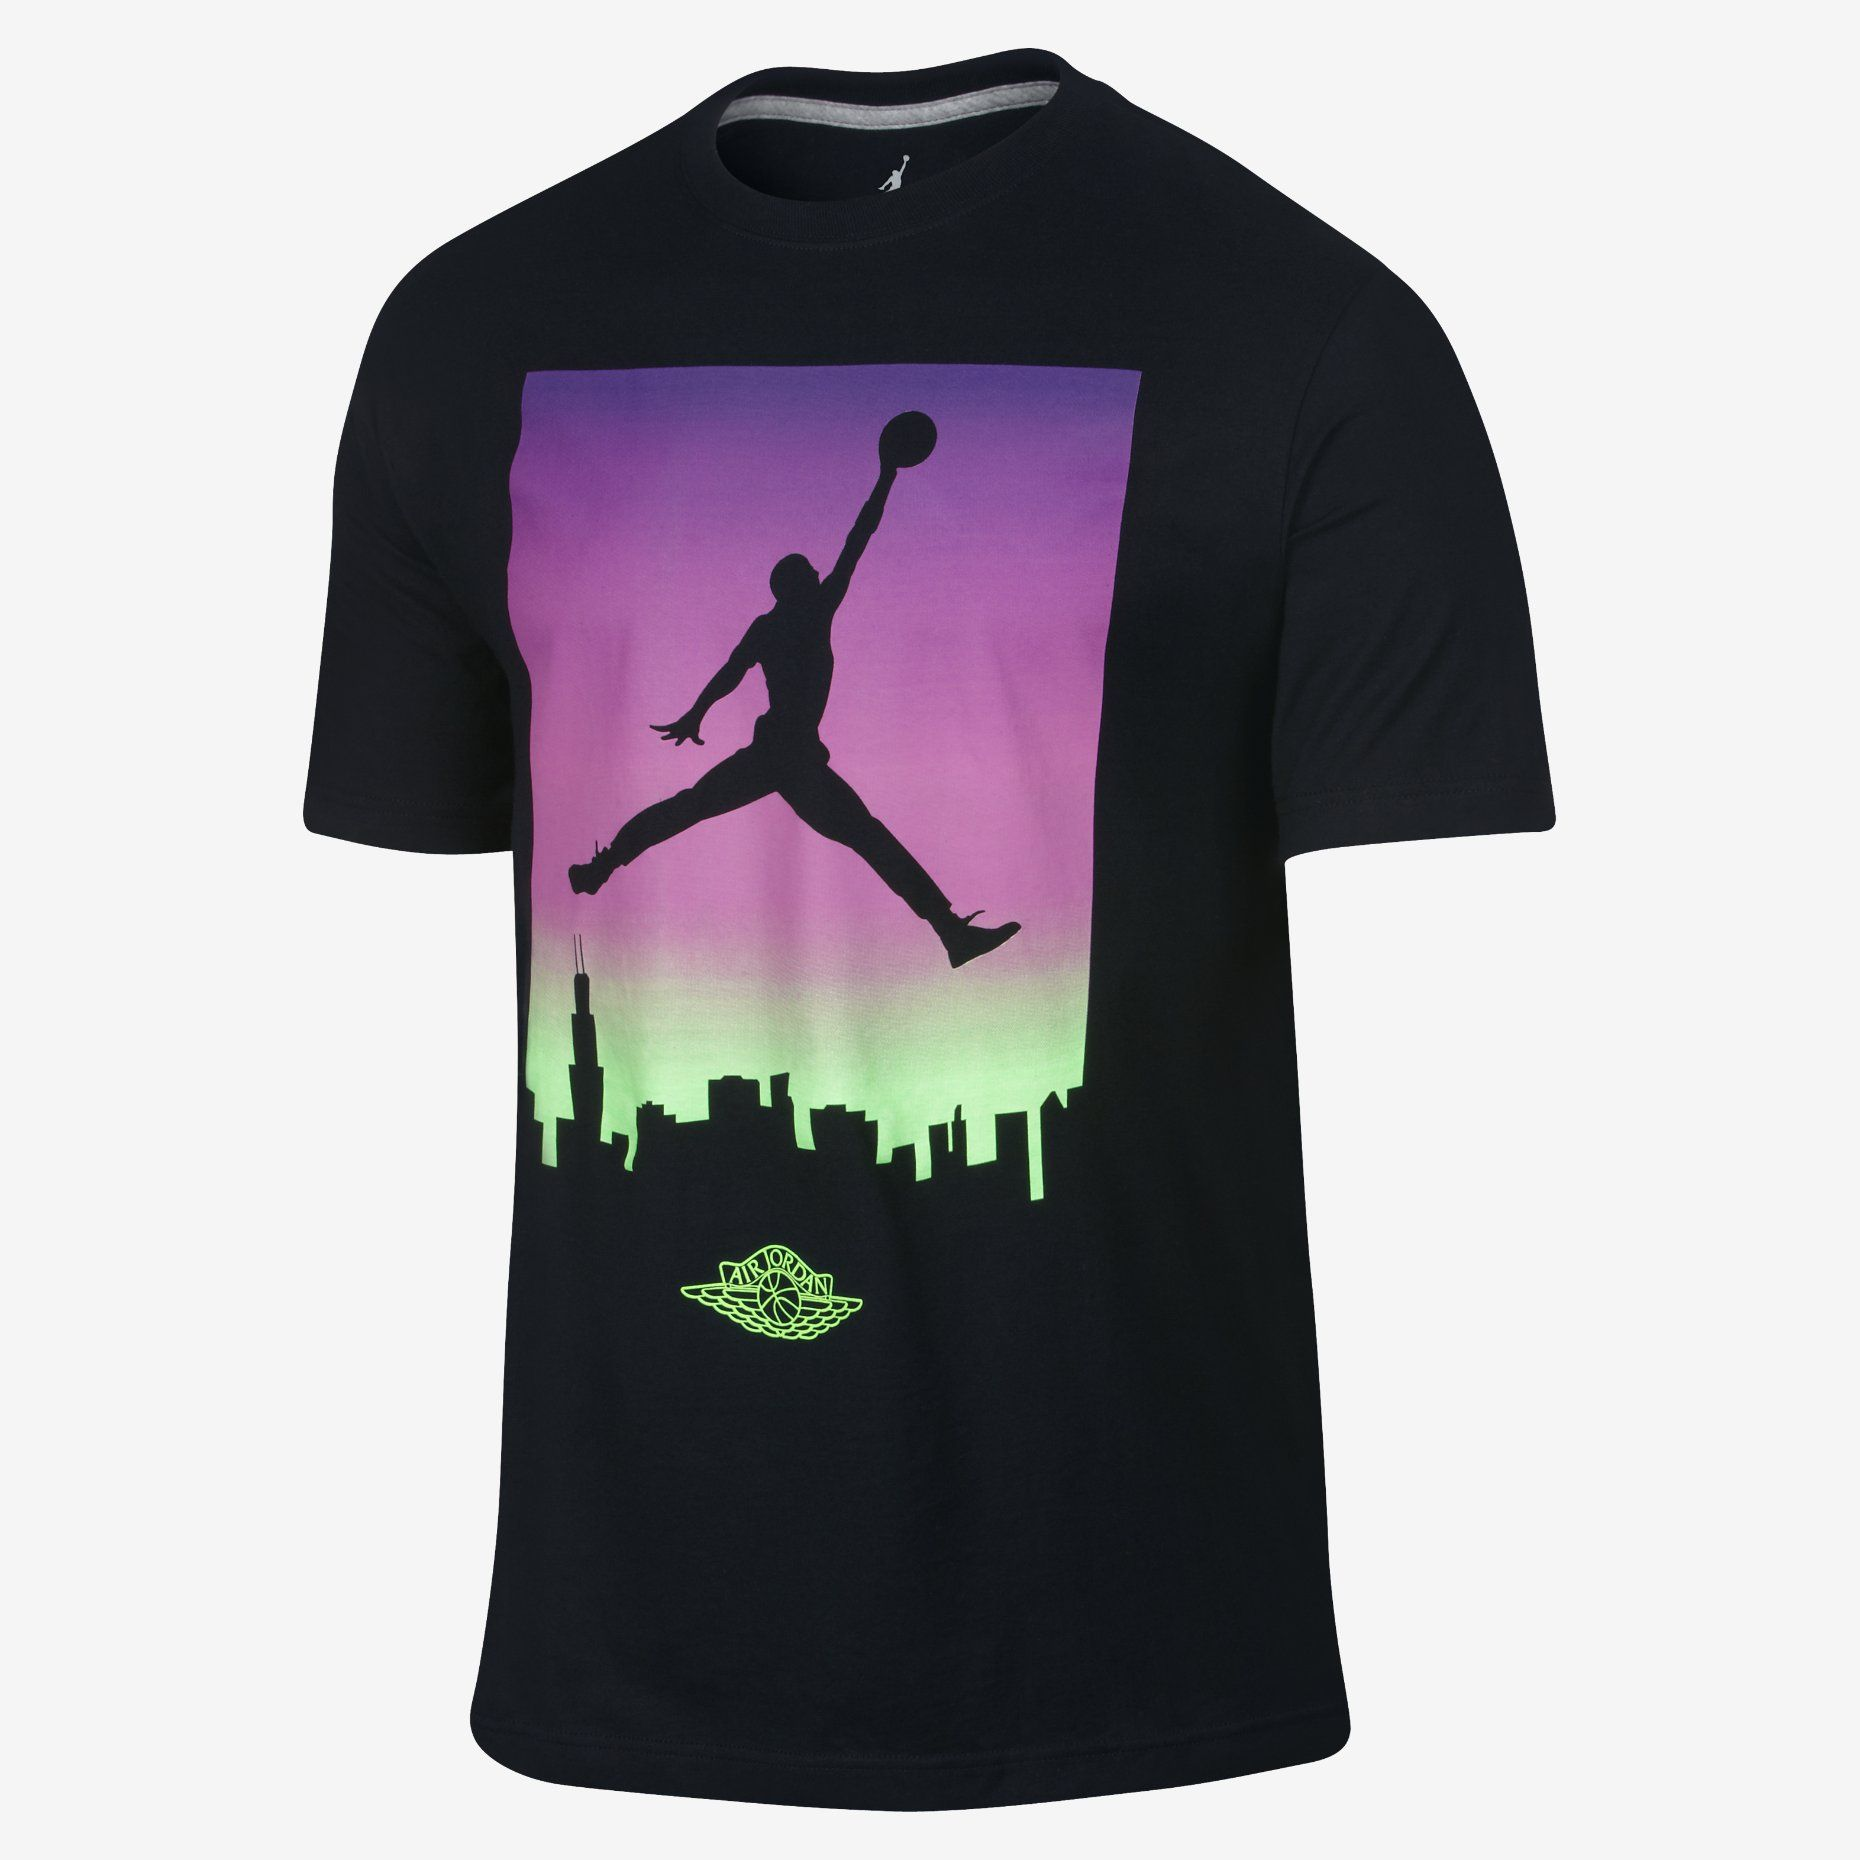 Nike Store. Air Jordan 1 Skyline Men's T-Shirt